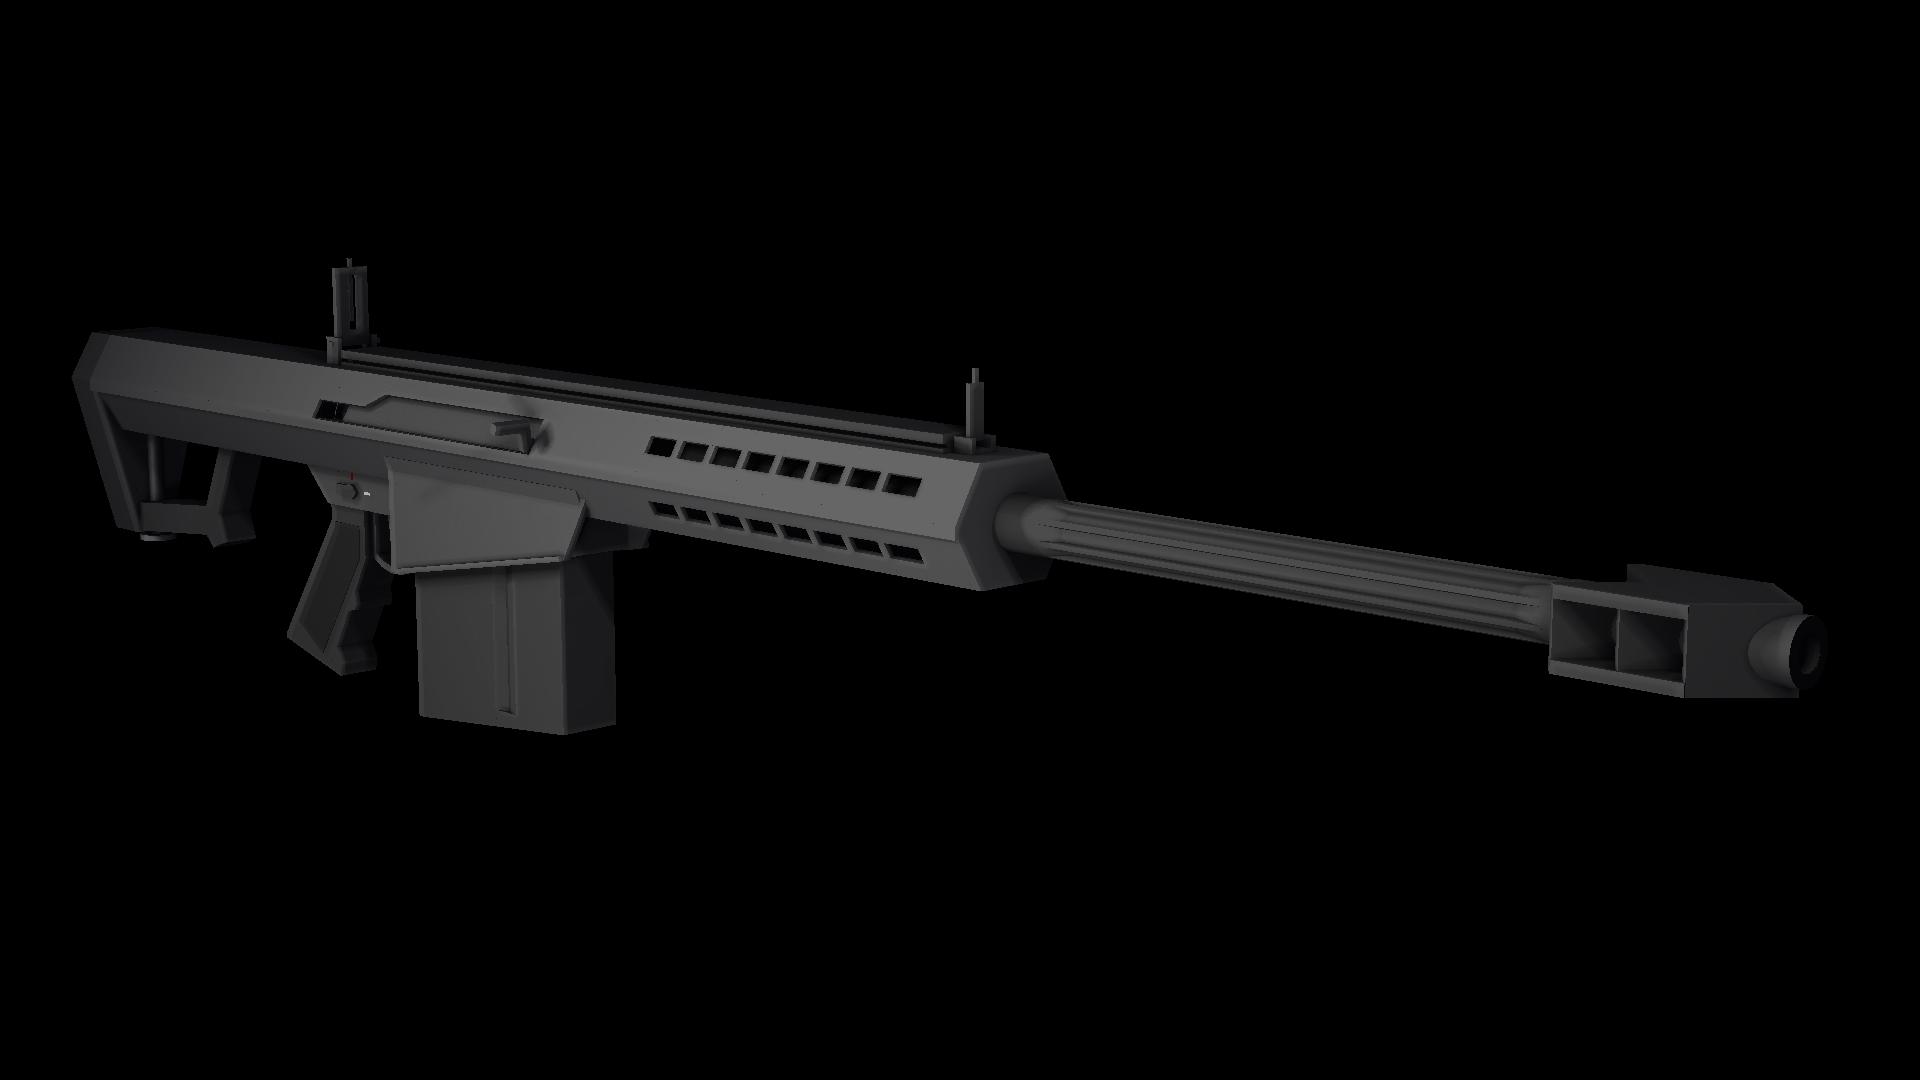 7_mar_21_guns-r_barrett.png